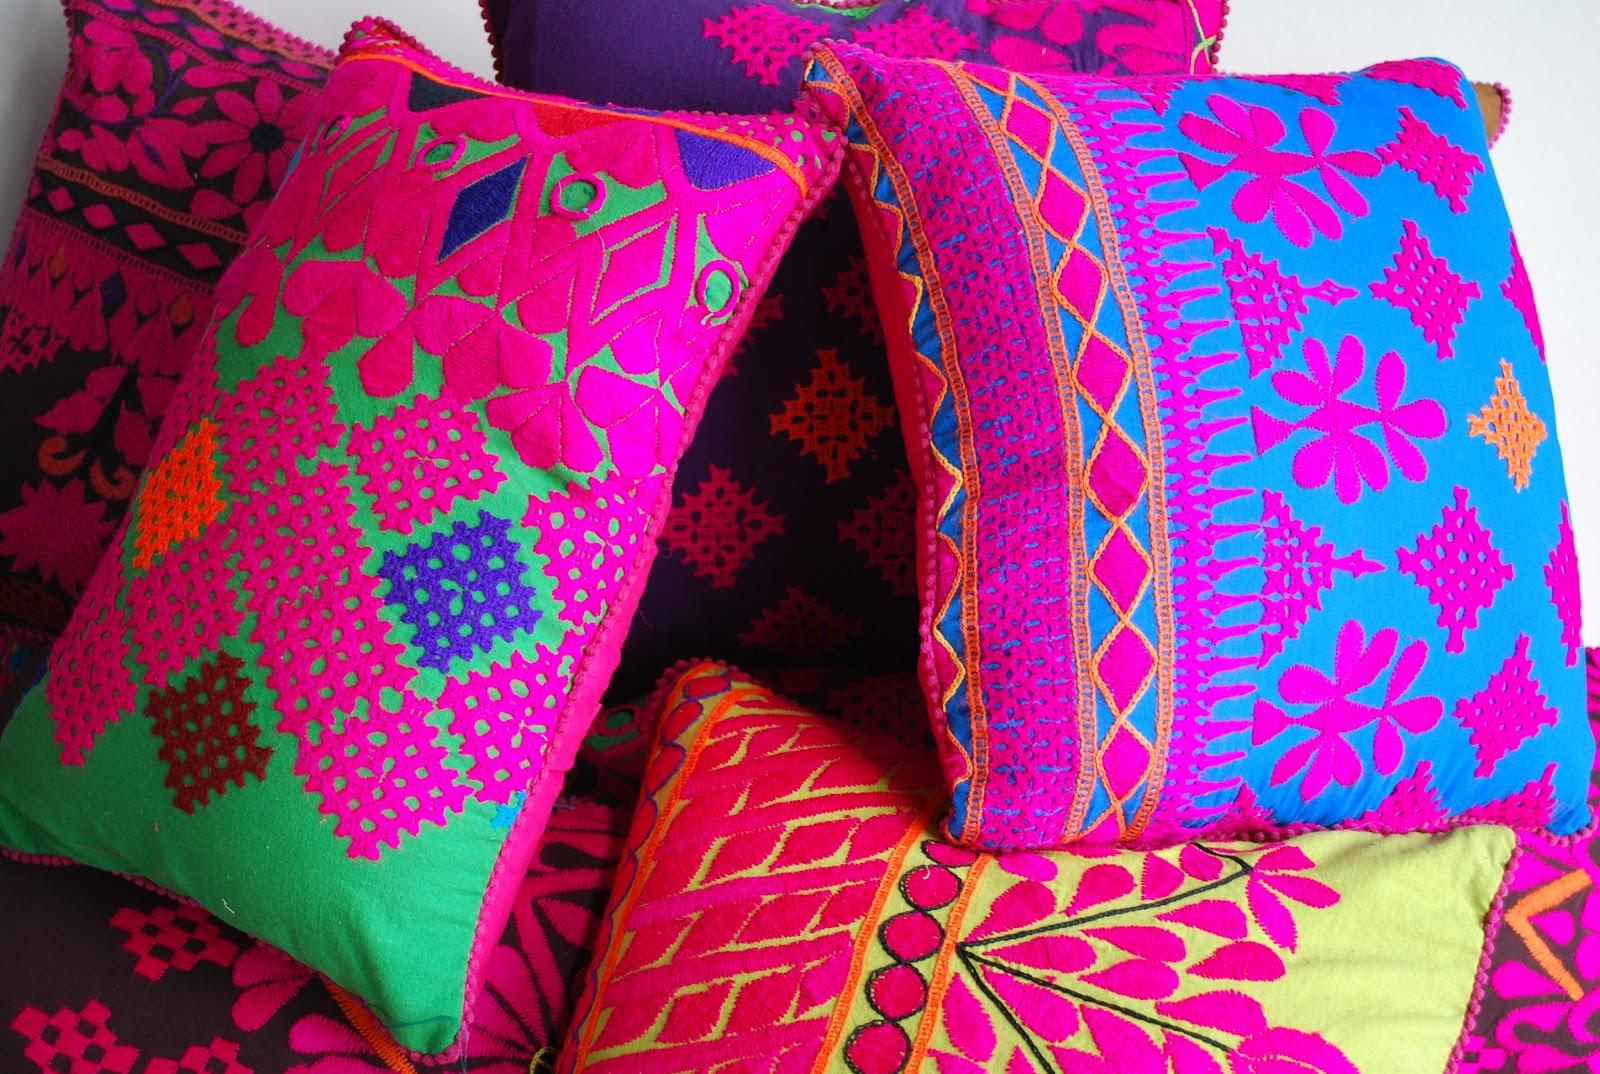 Floor throw pillows Floor pillows for kids Decorative suzani pillows Decorative throws